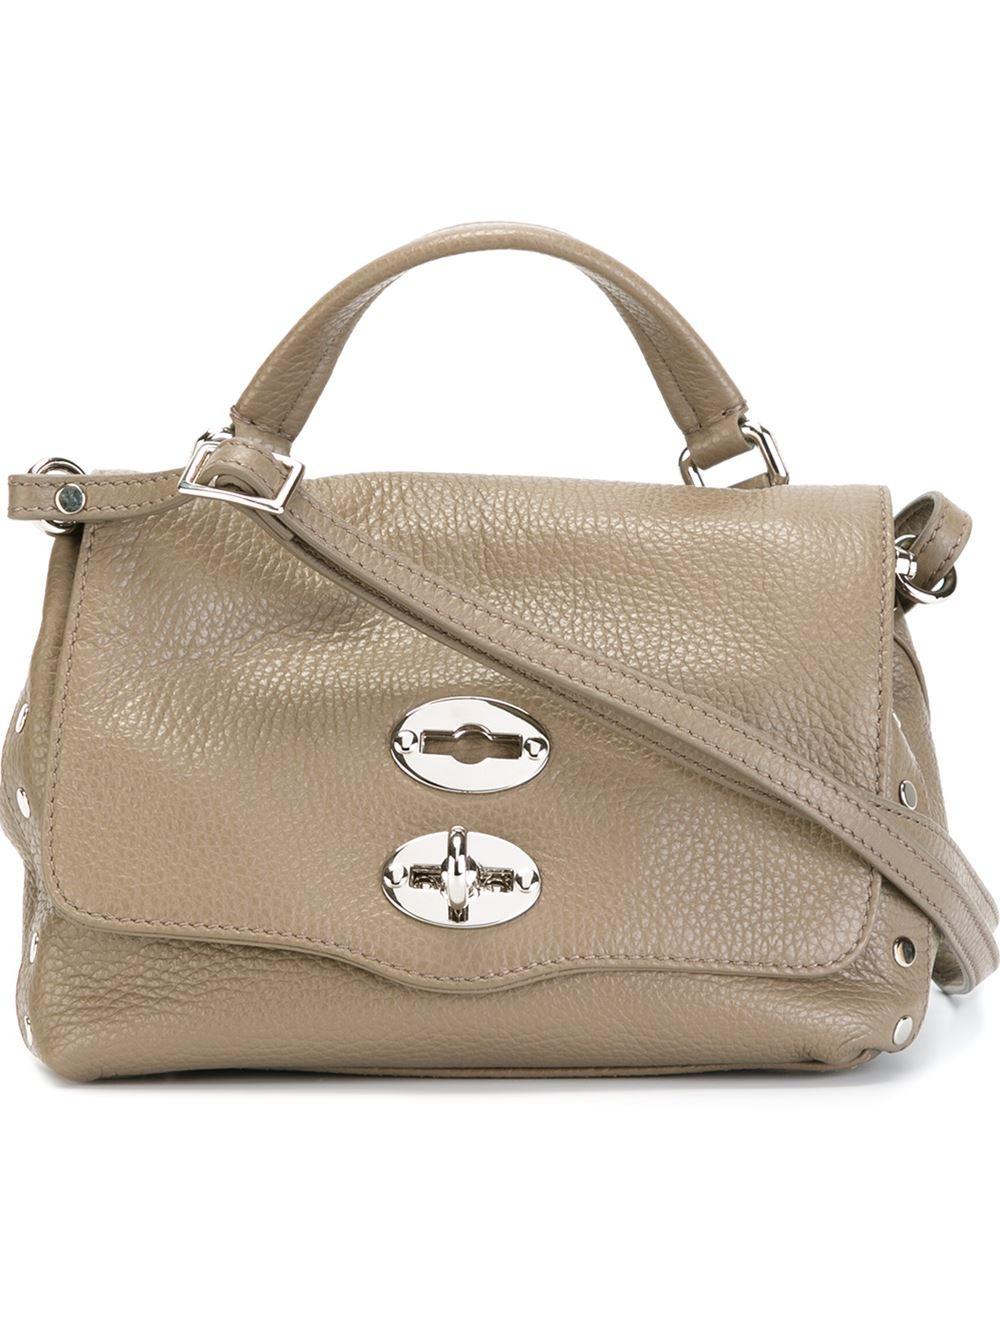 Zanellato baby postina hand bag 65h3Jl5